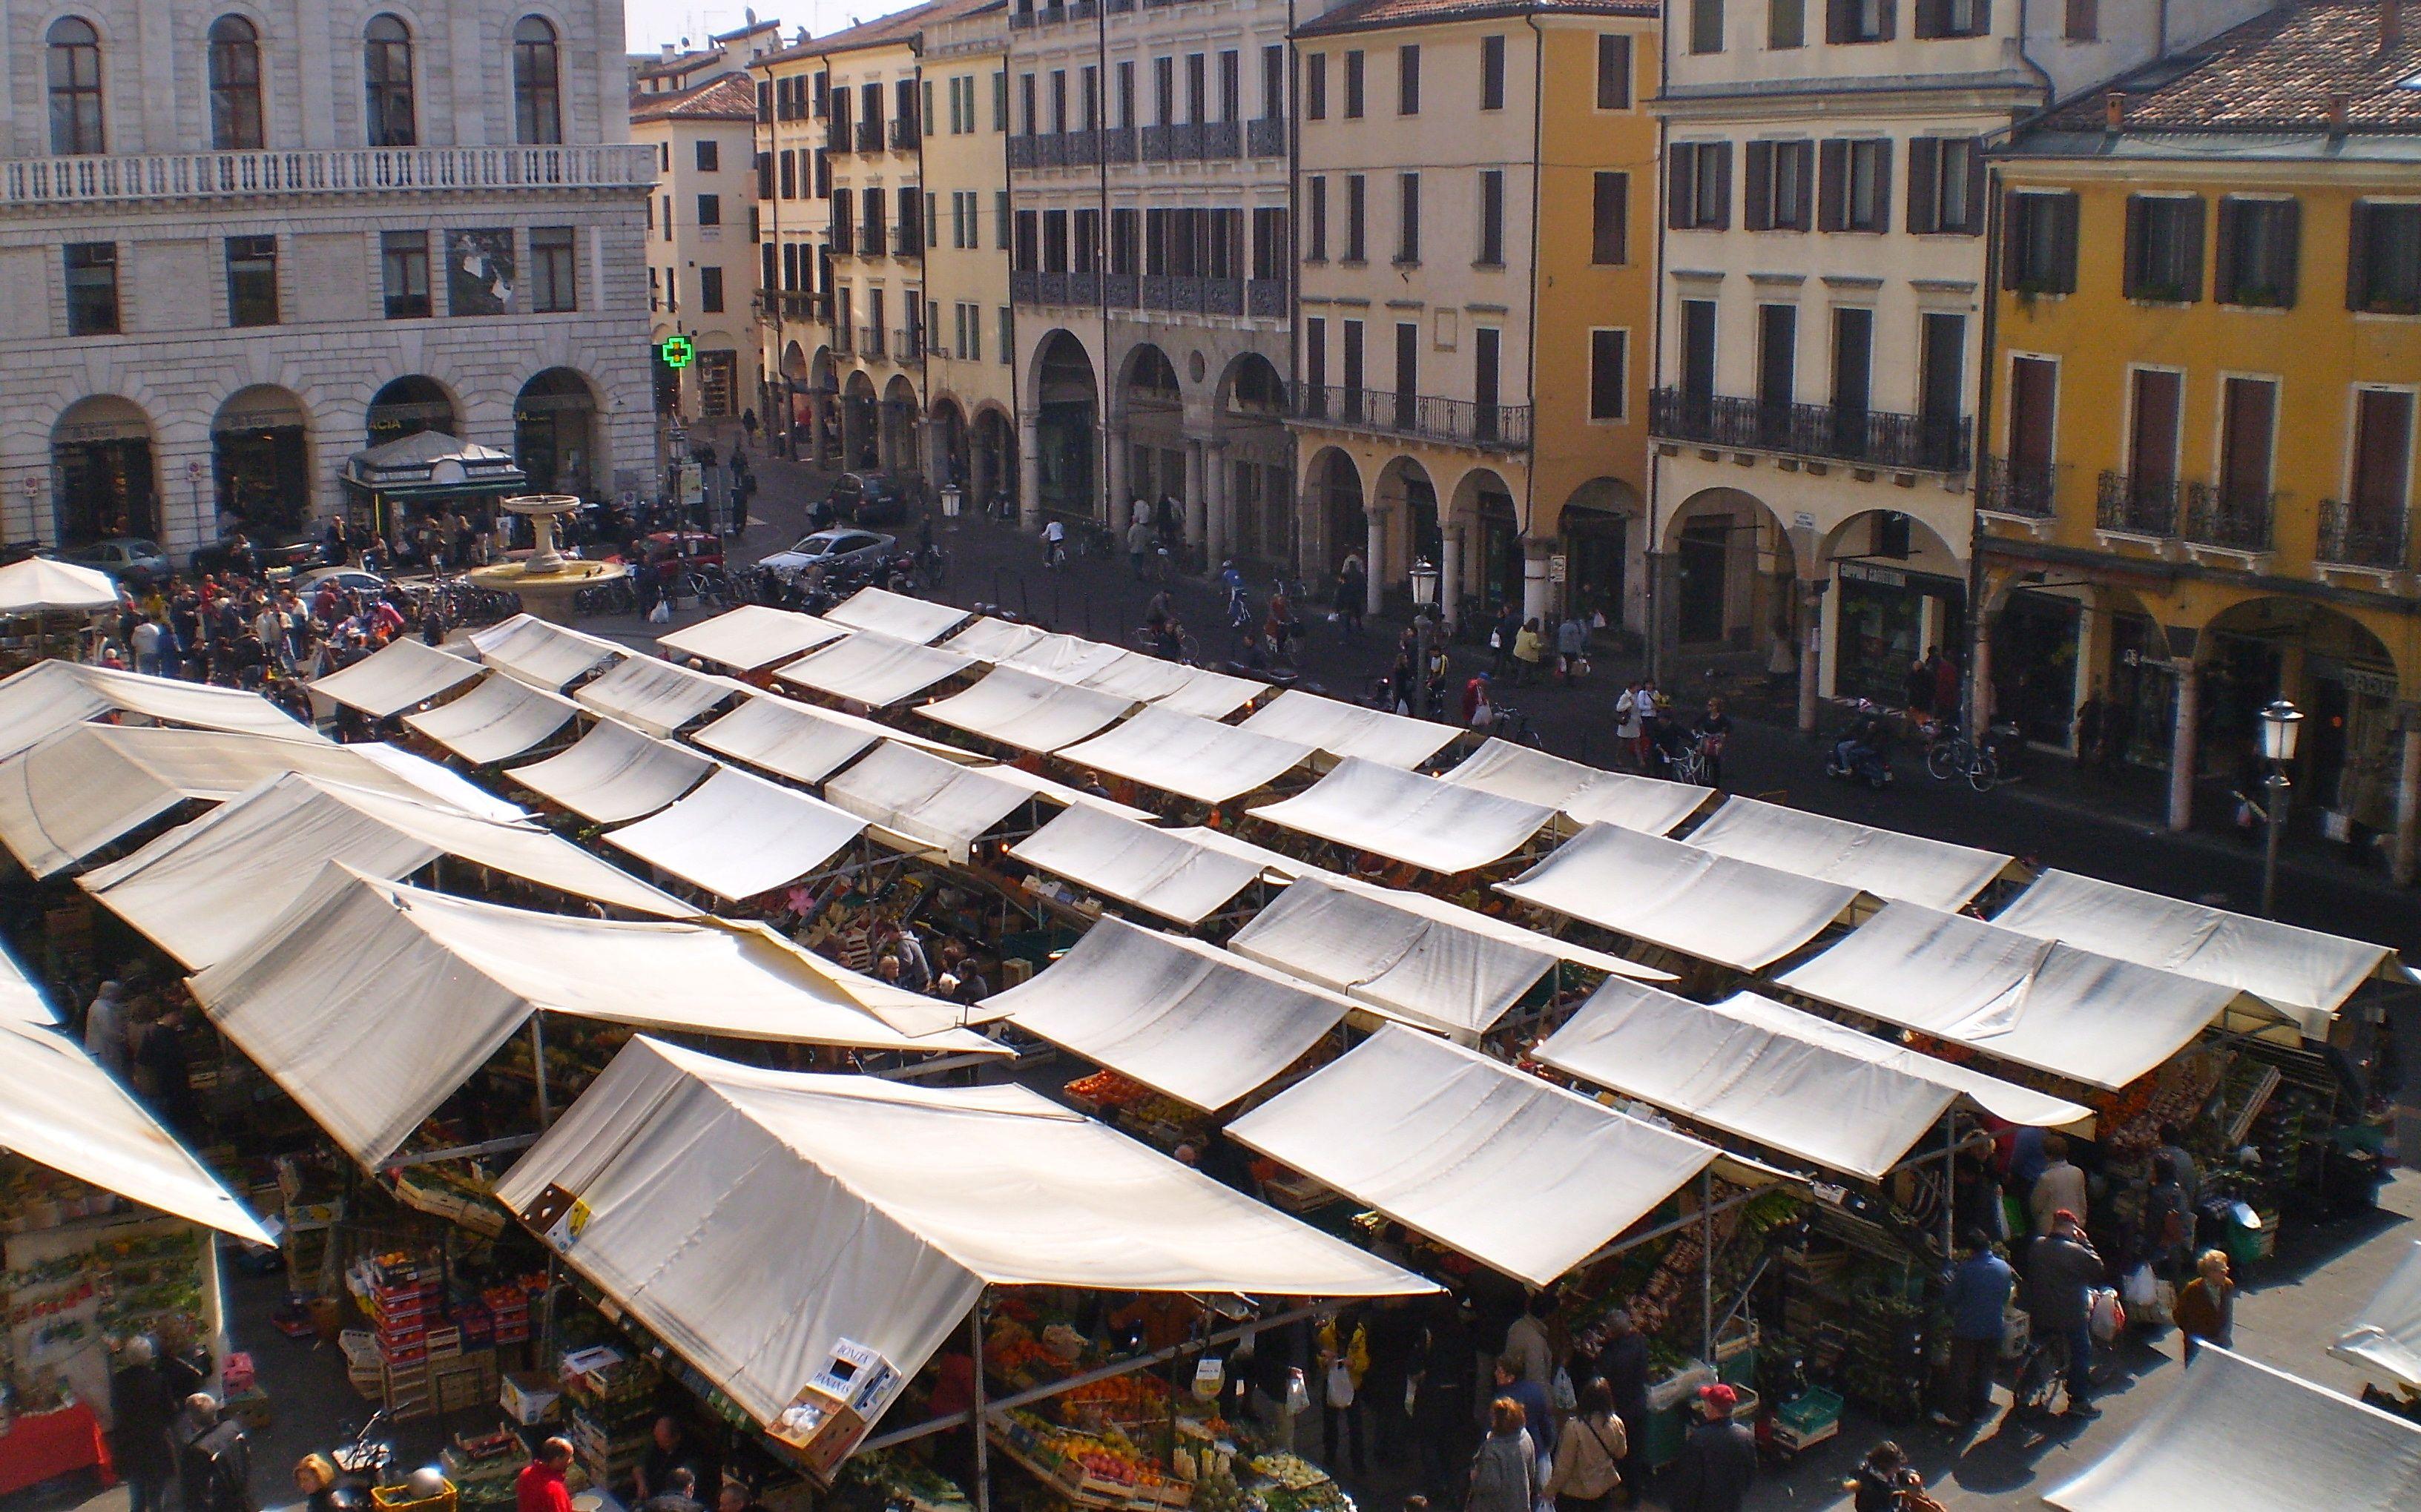 I ga iga i gai au vent mauvais for Mercato antiquariato padova